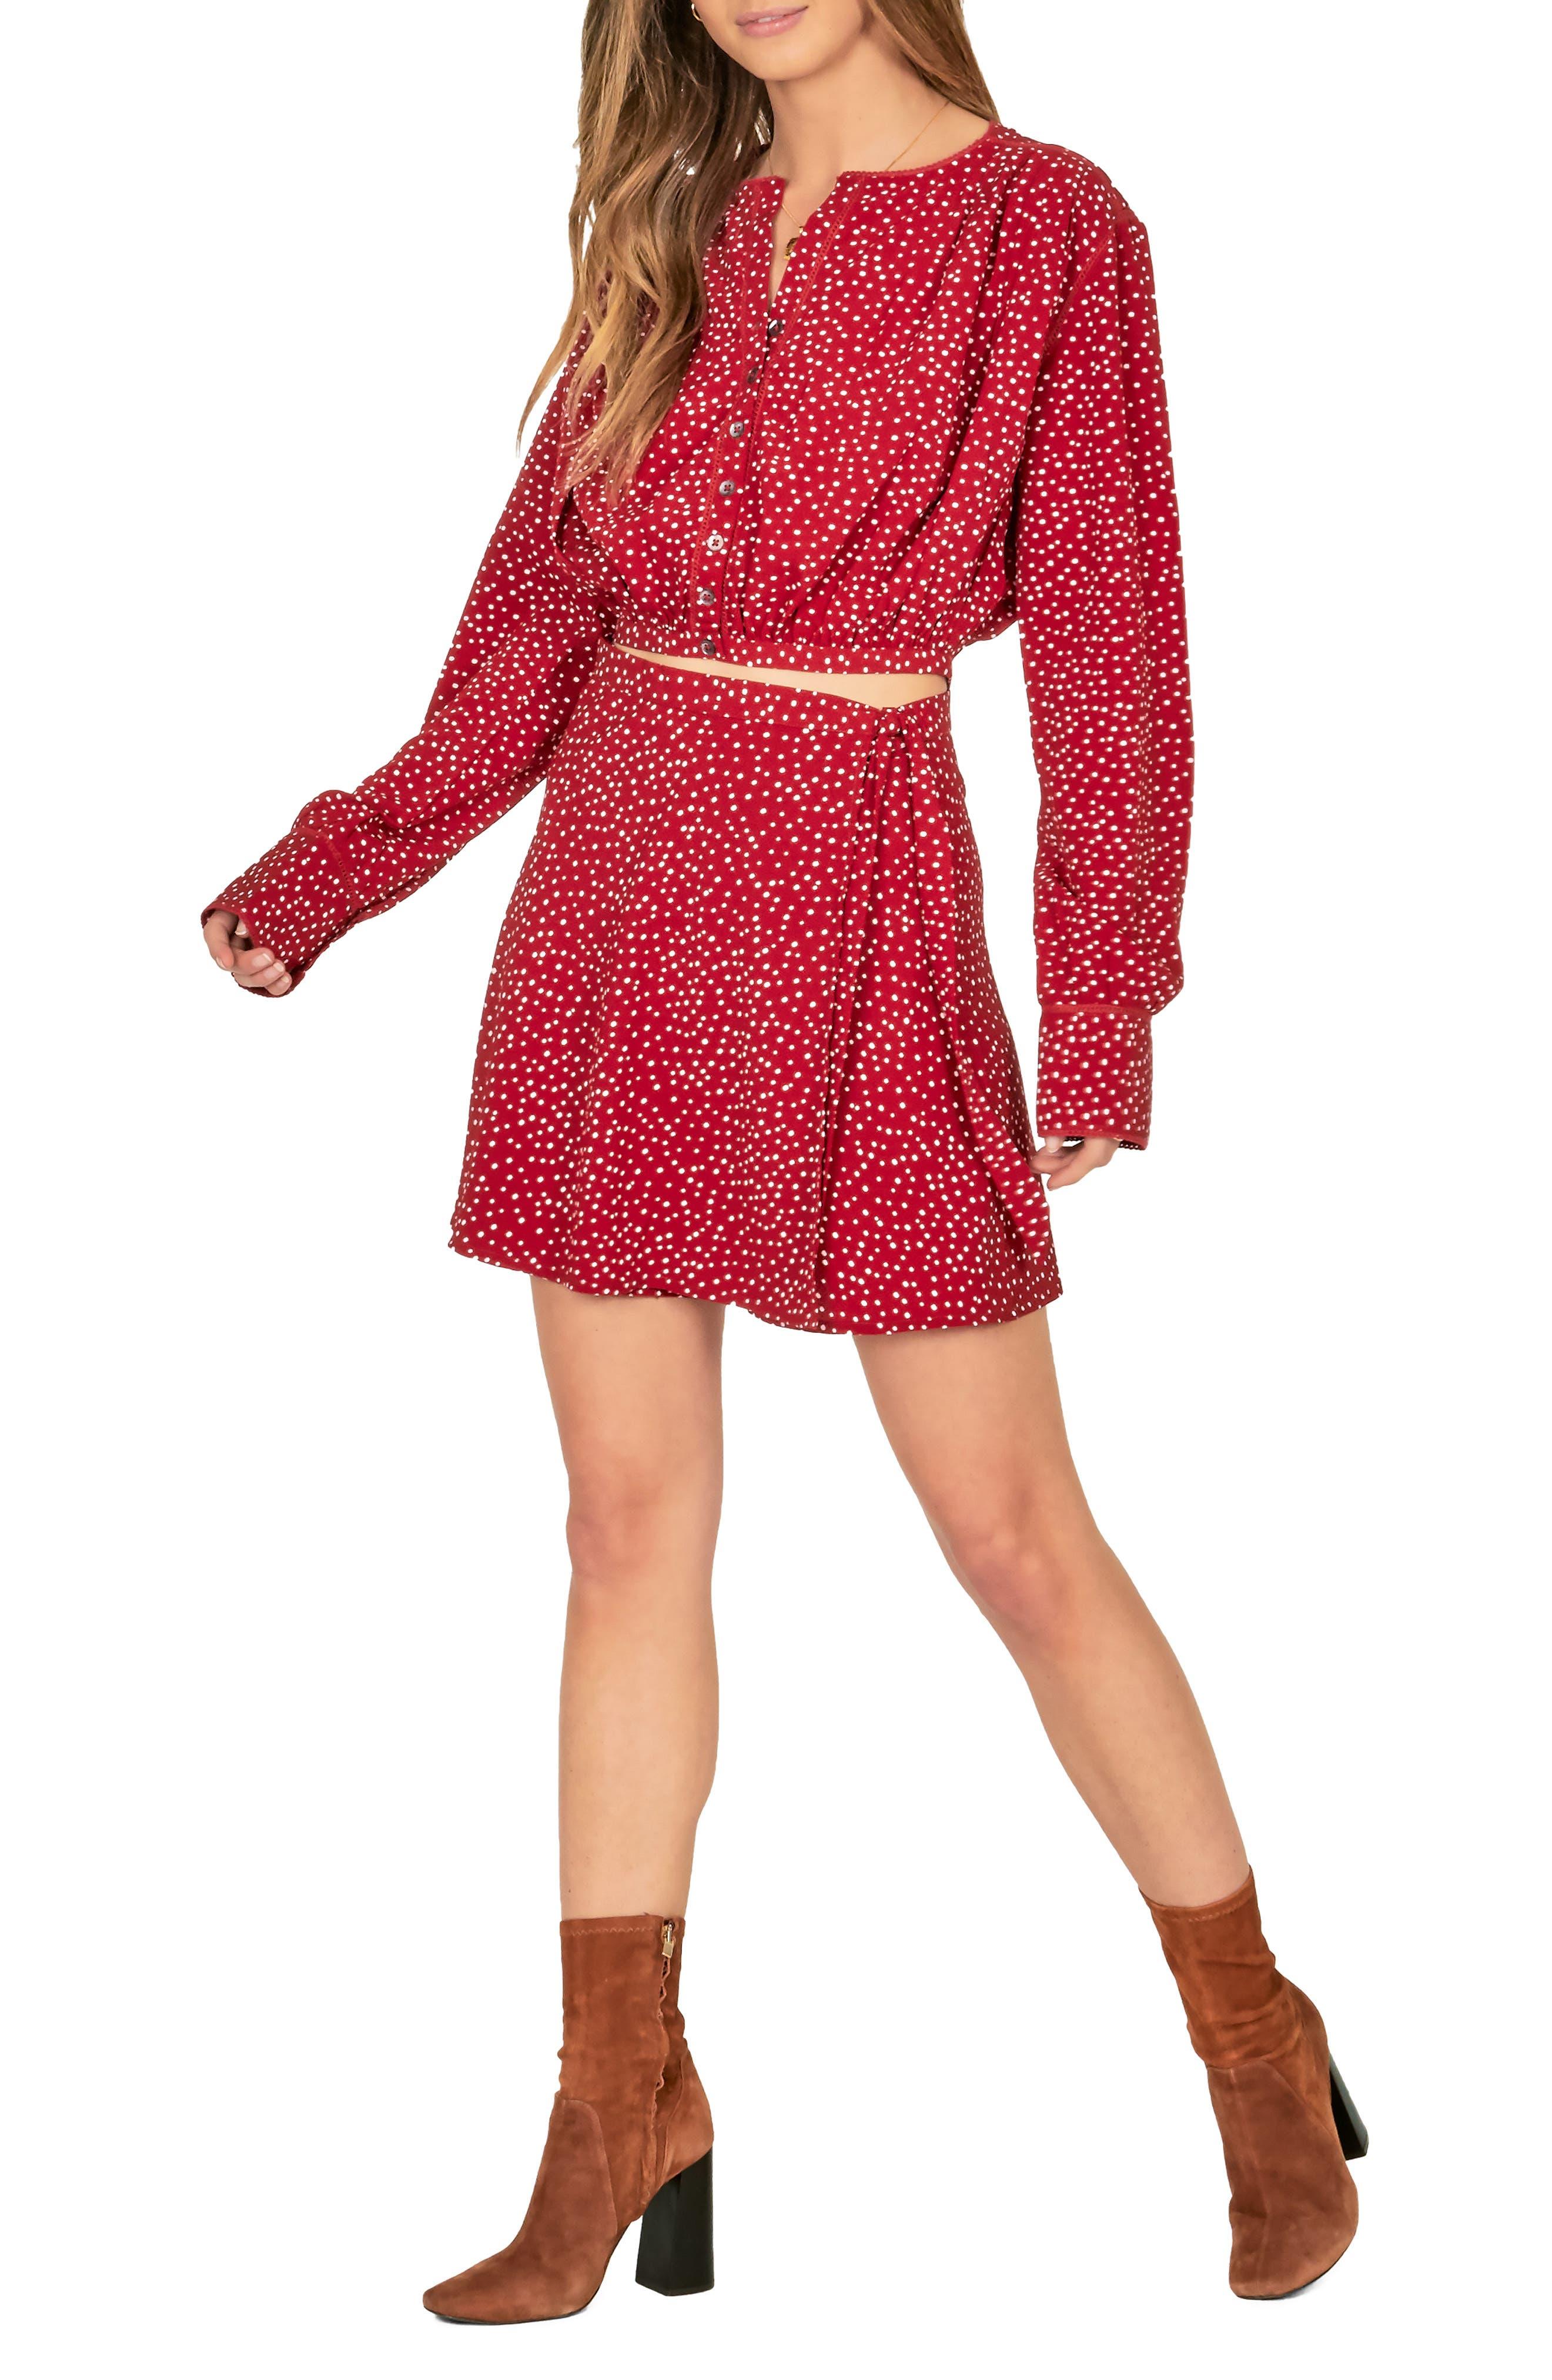 Hey Dottie Wrap Skirt in Crimson